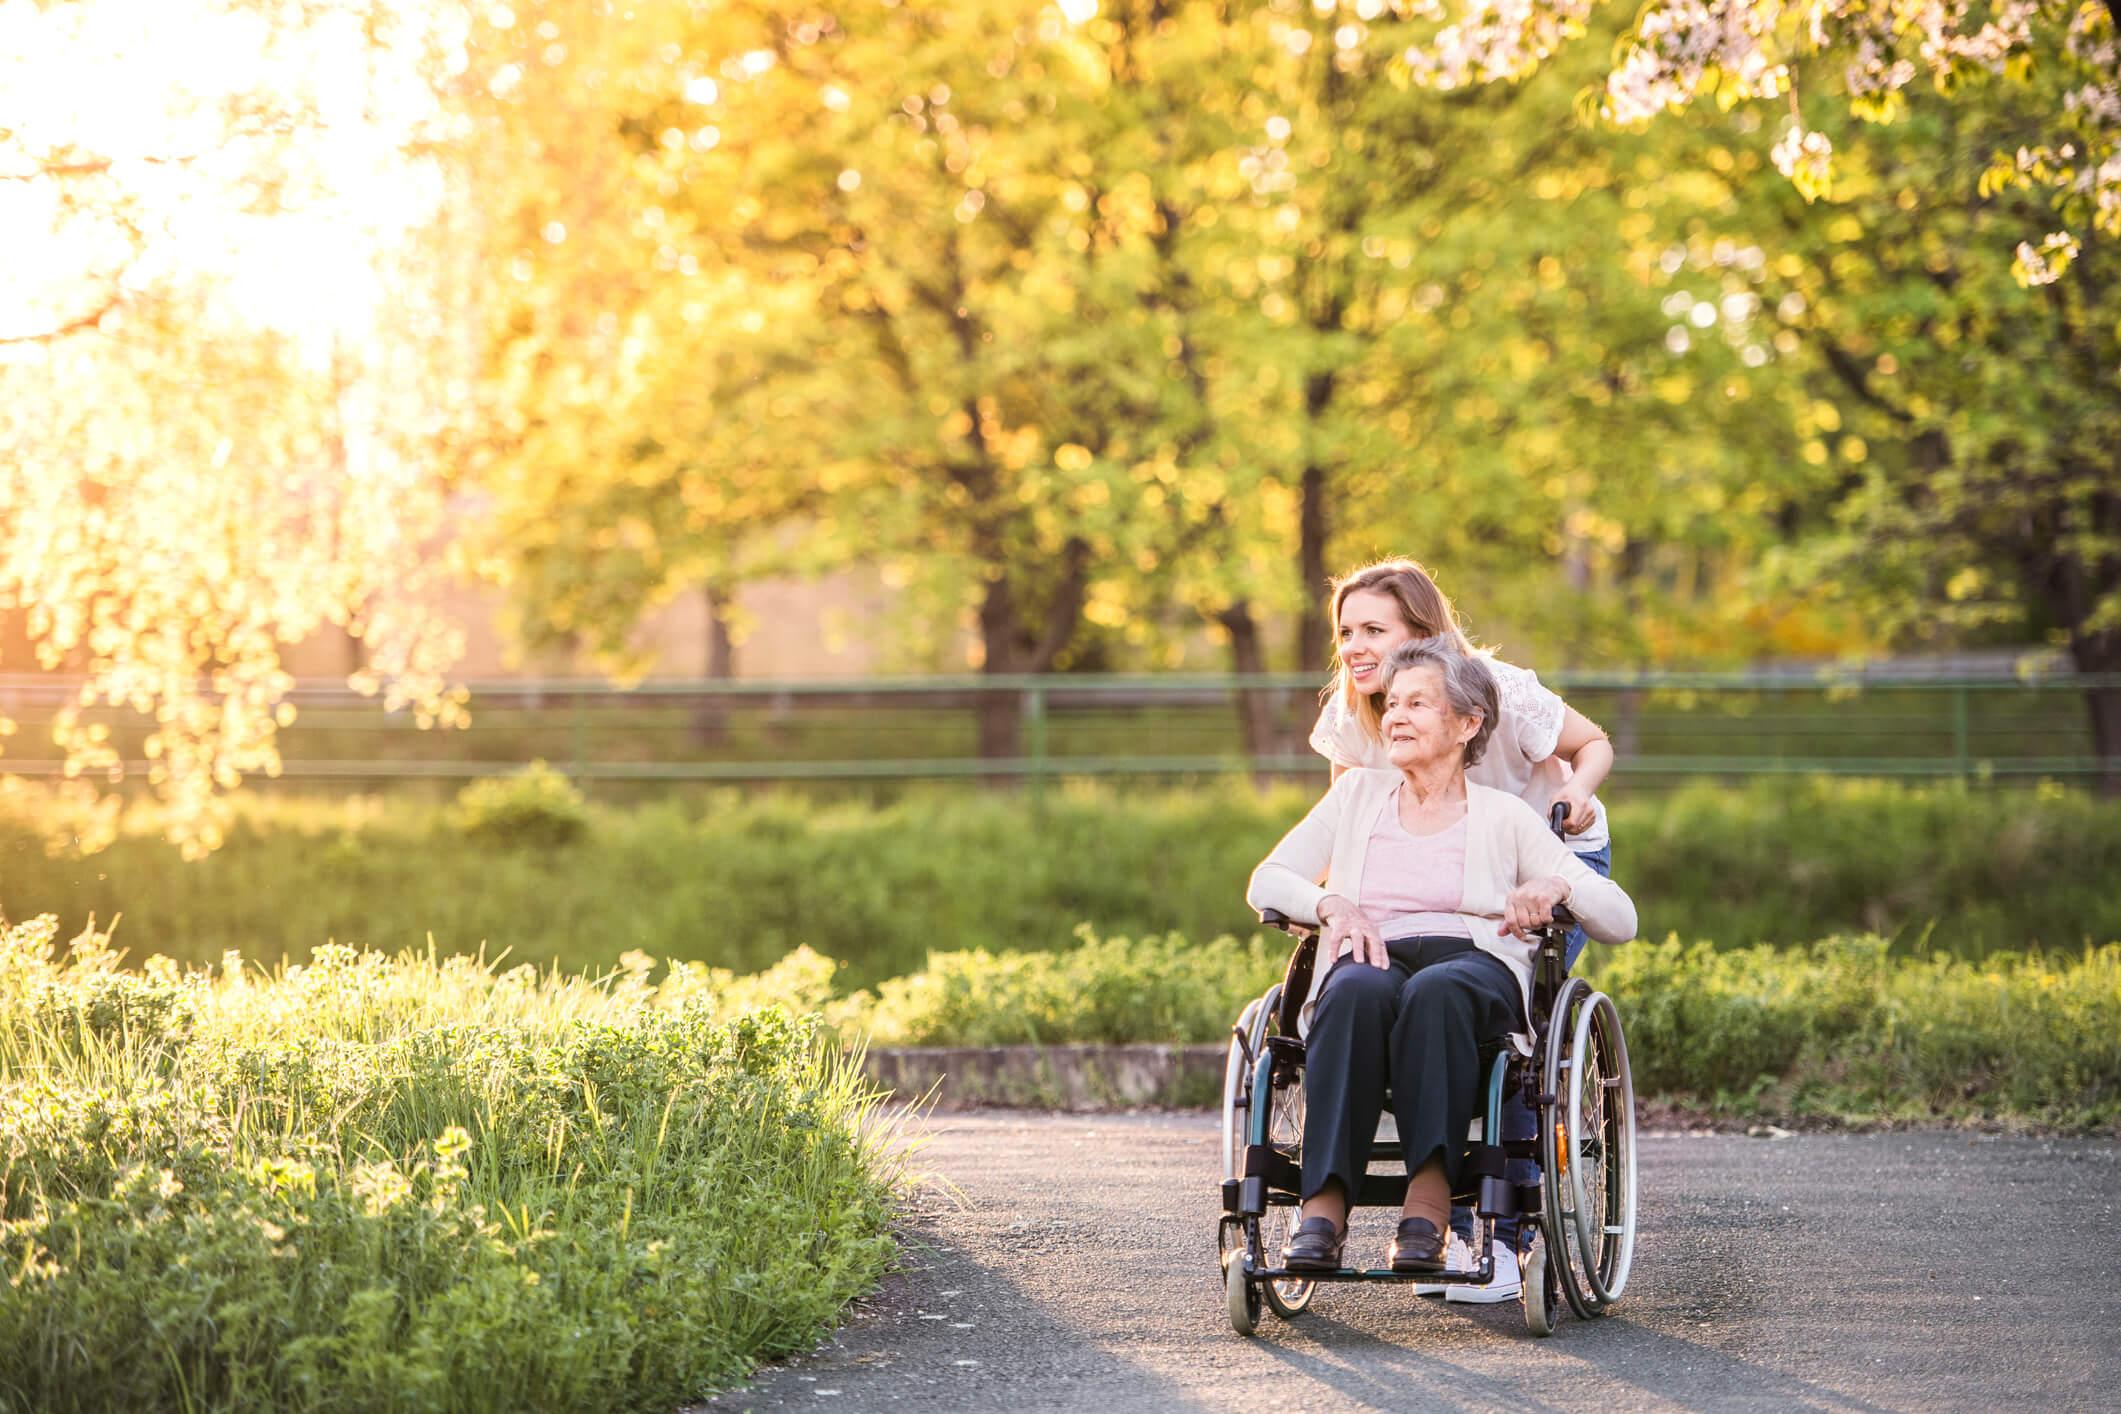 14 Resources for Caregivers in Alpharetta Georgia